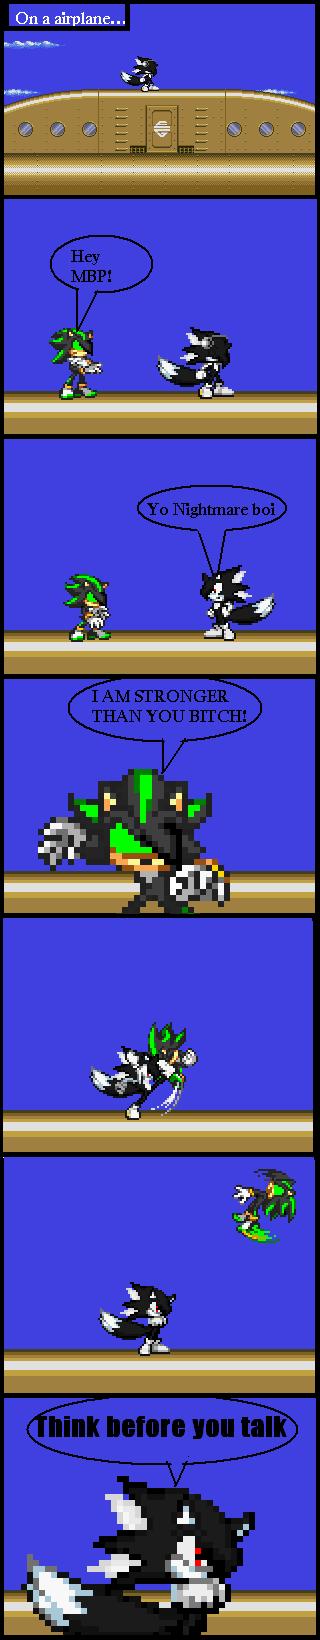 Nightmare gets it by NinjaZetro